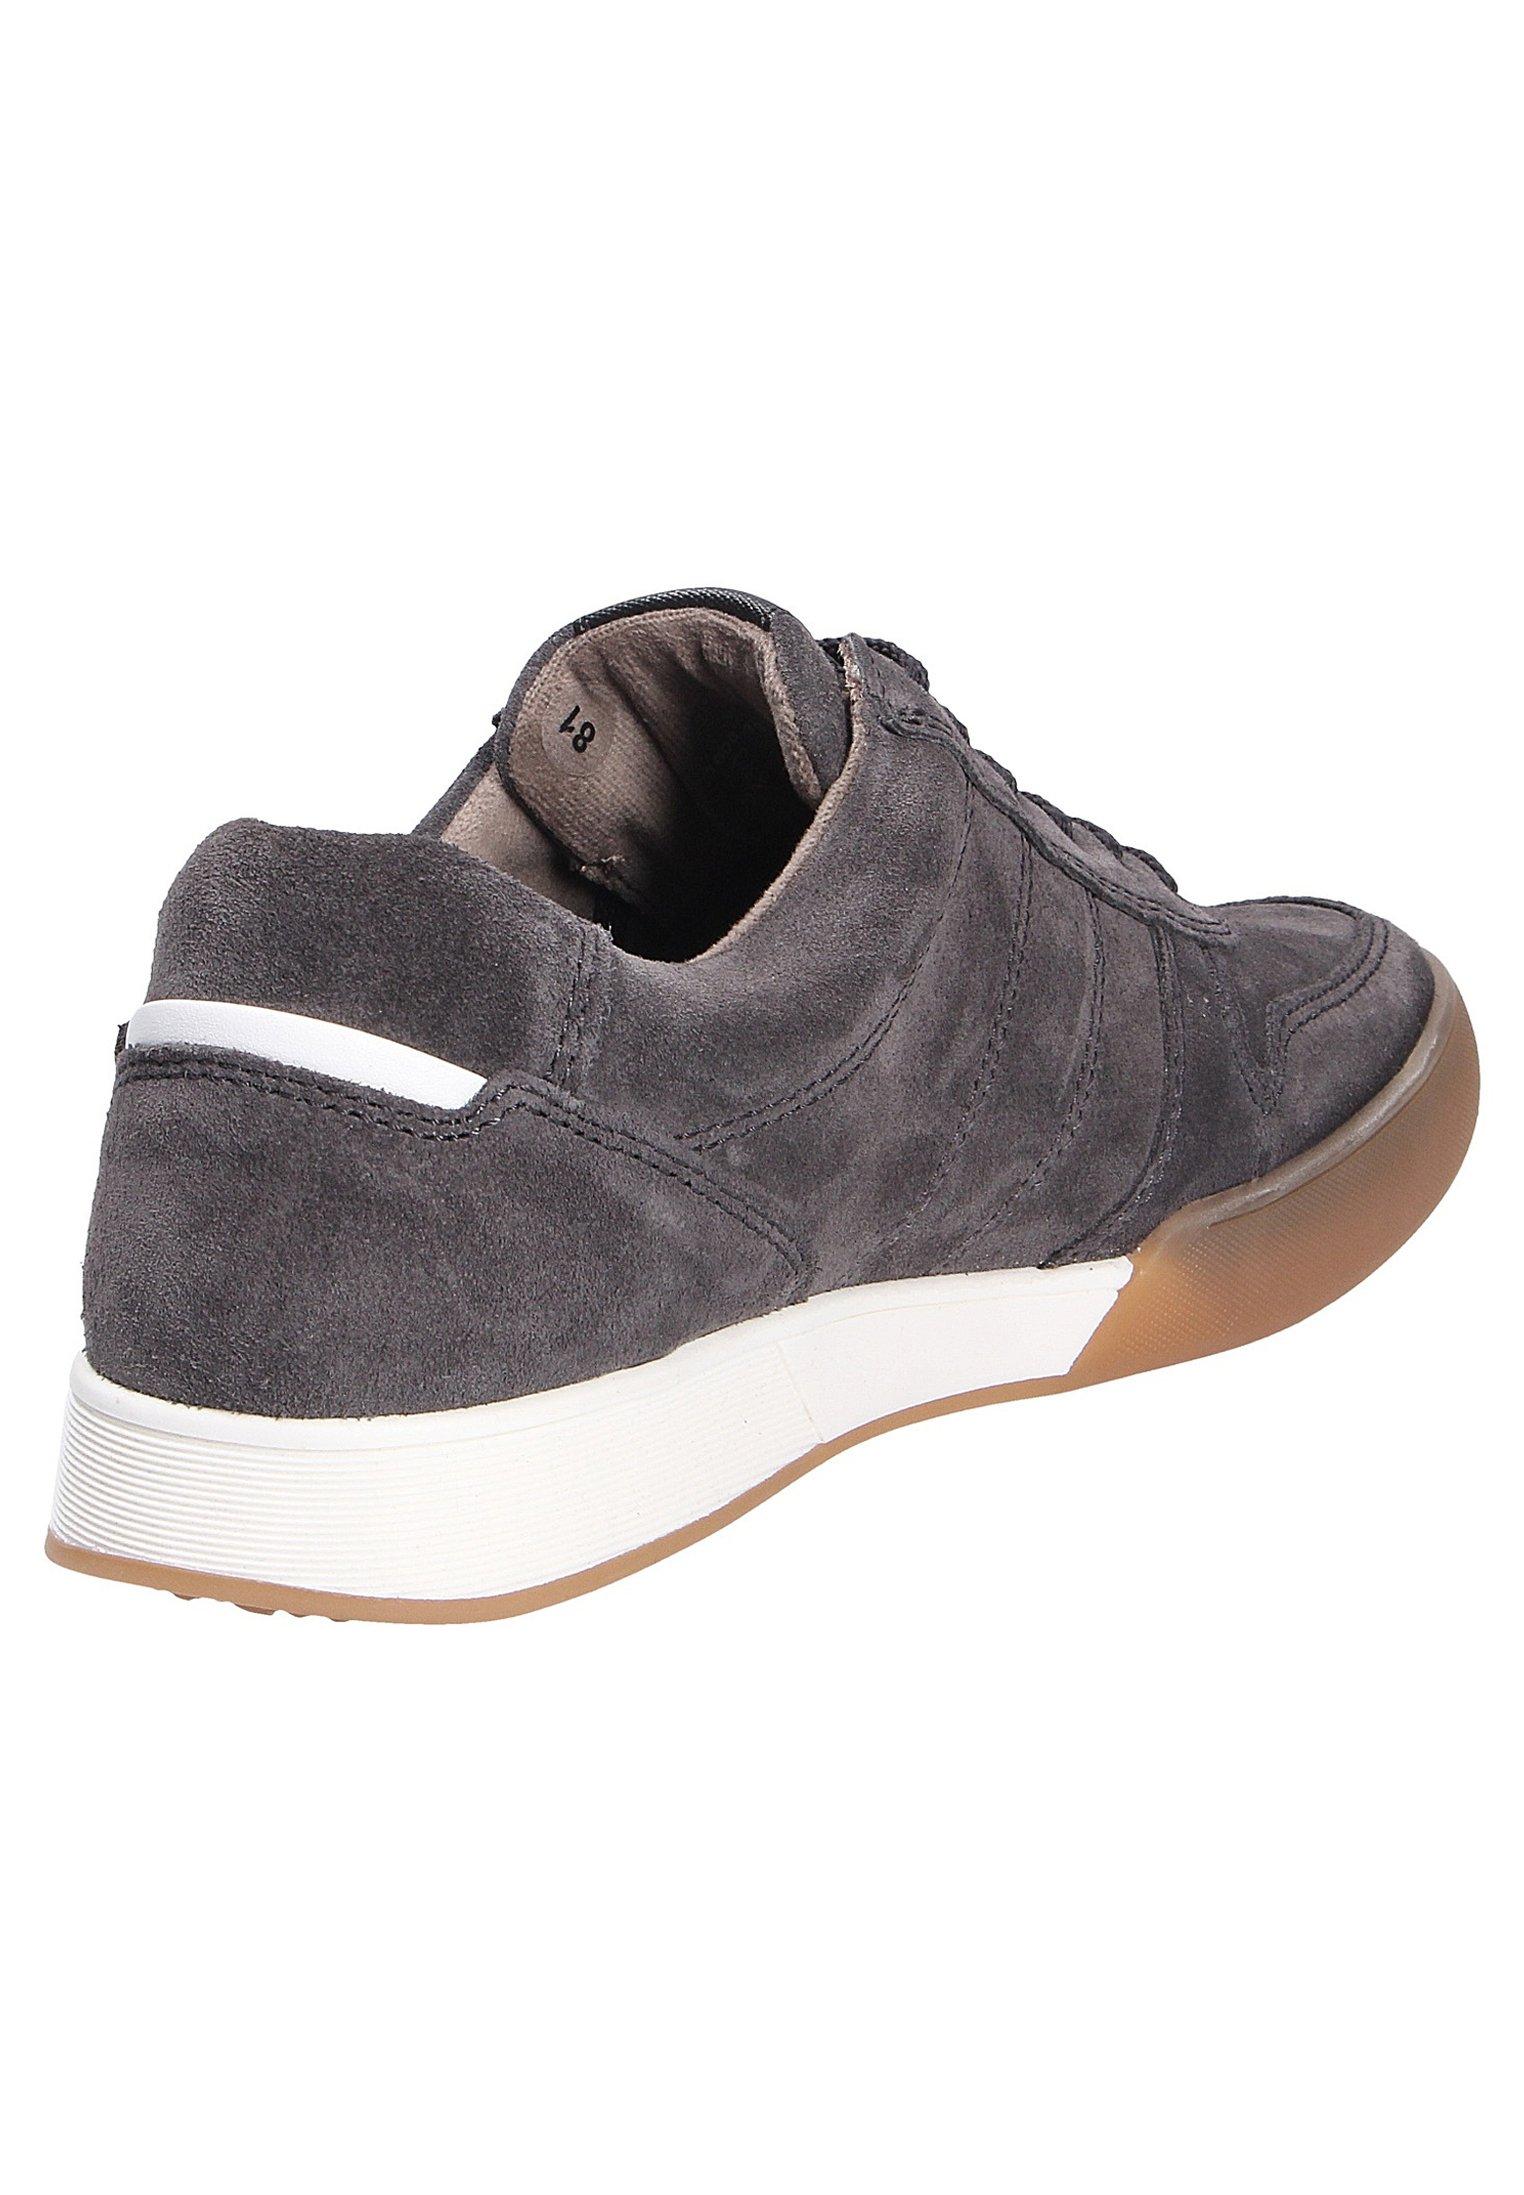 Gabor Sneaker low - dkgrey (10)/grau - Herrenschuhe emMYA